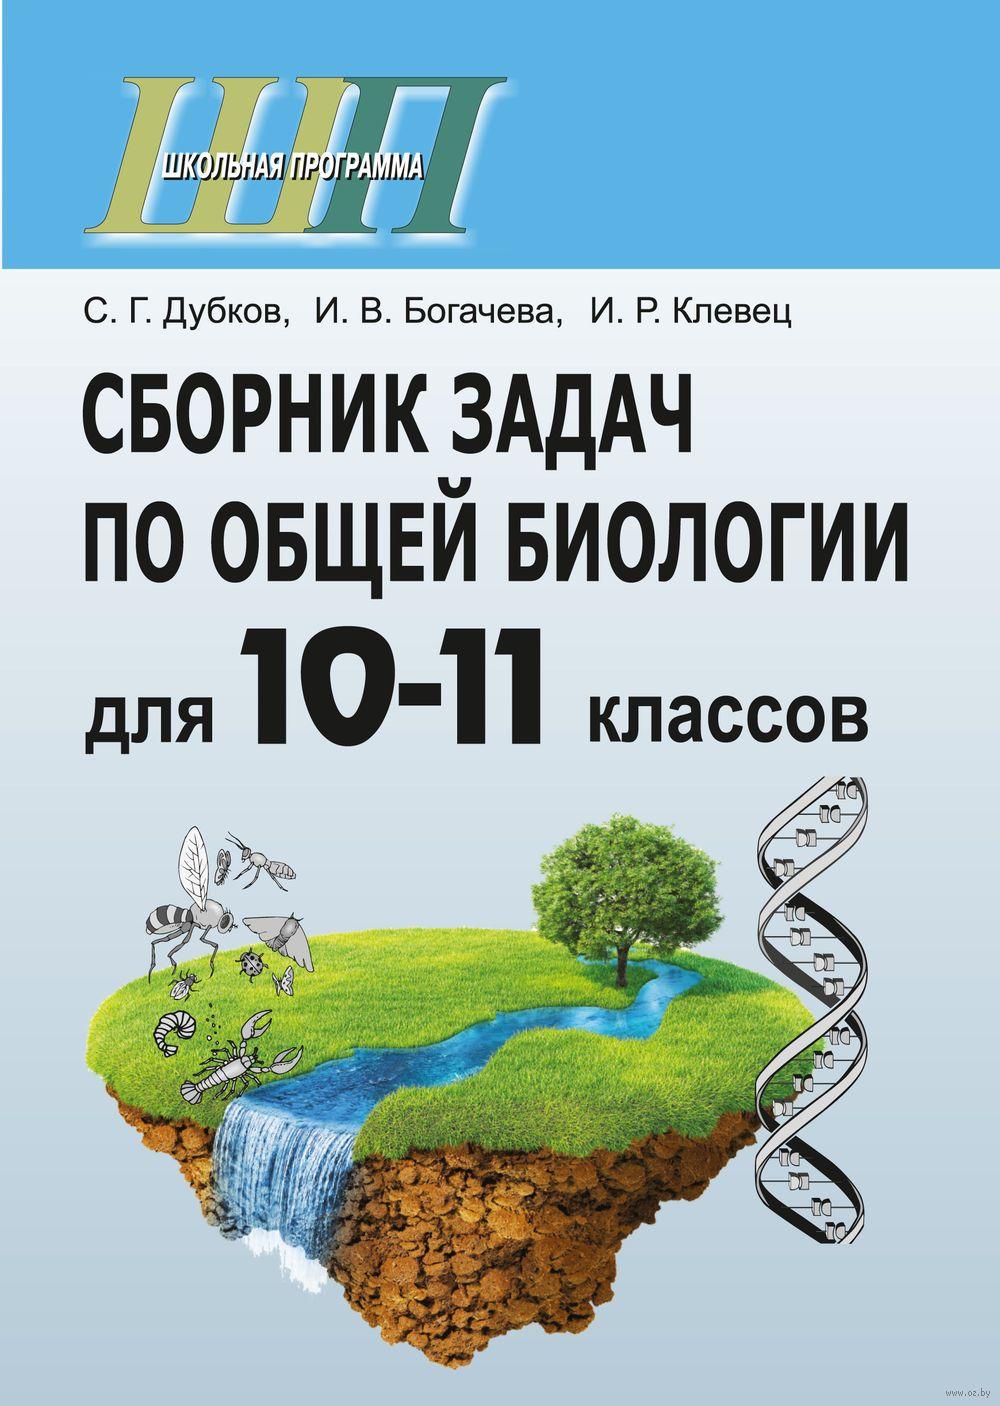 решебник на сборник задач по биологии 10-11